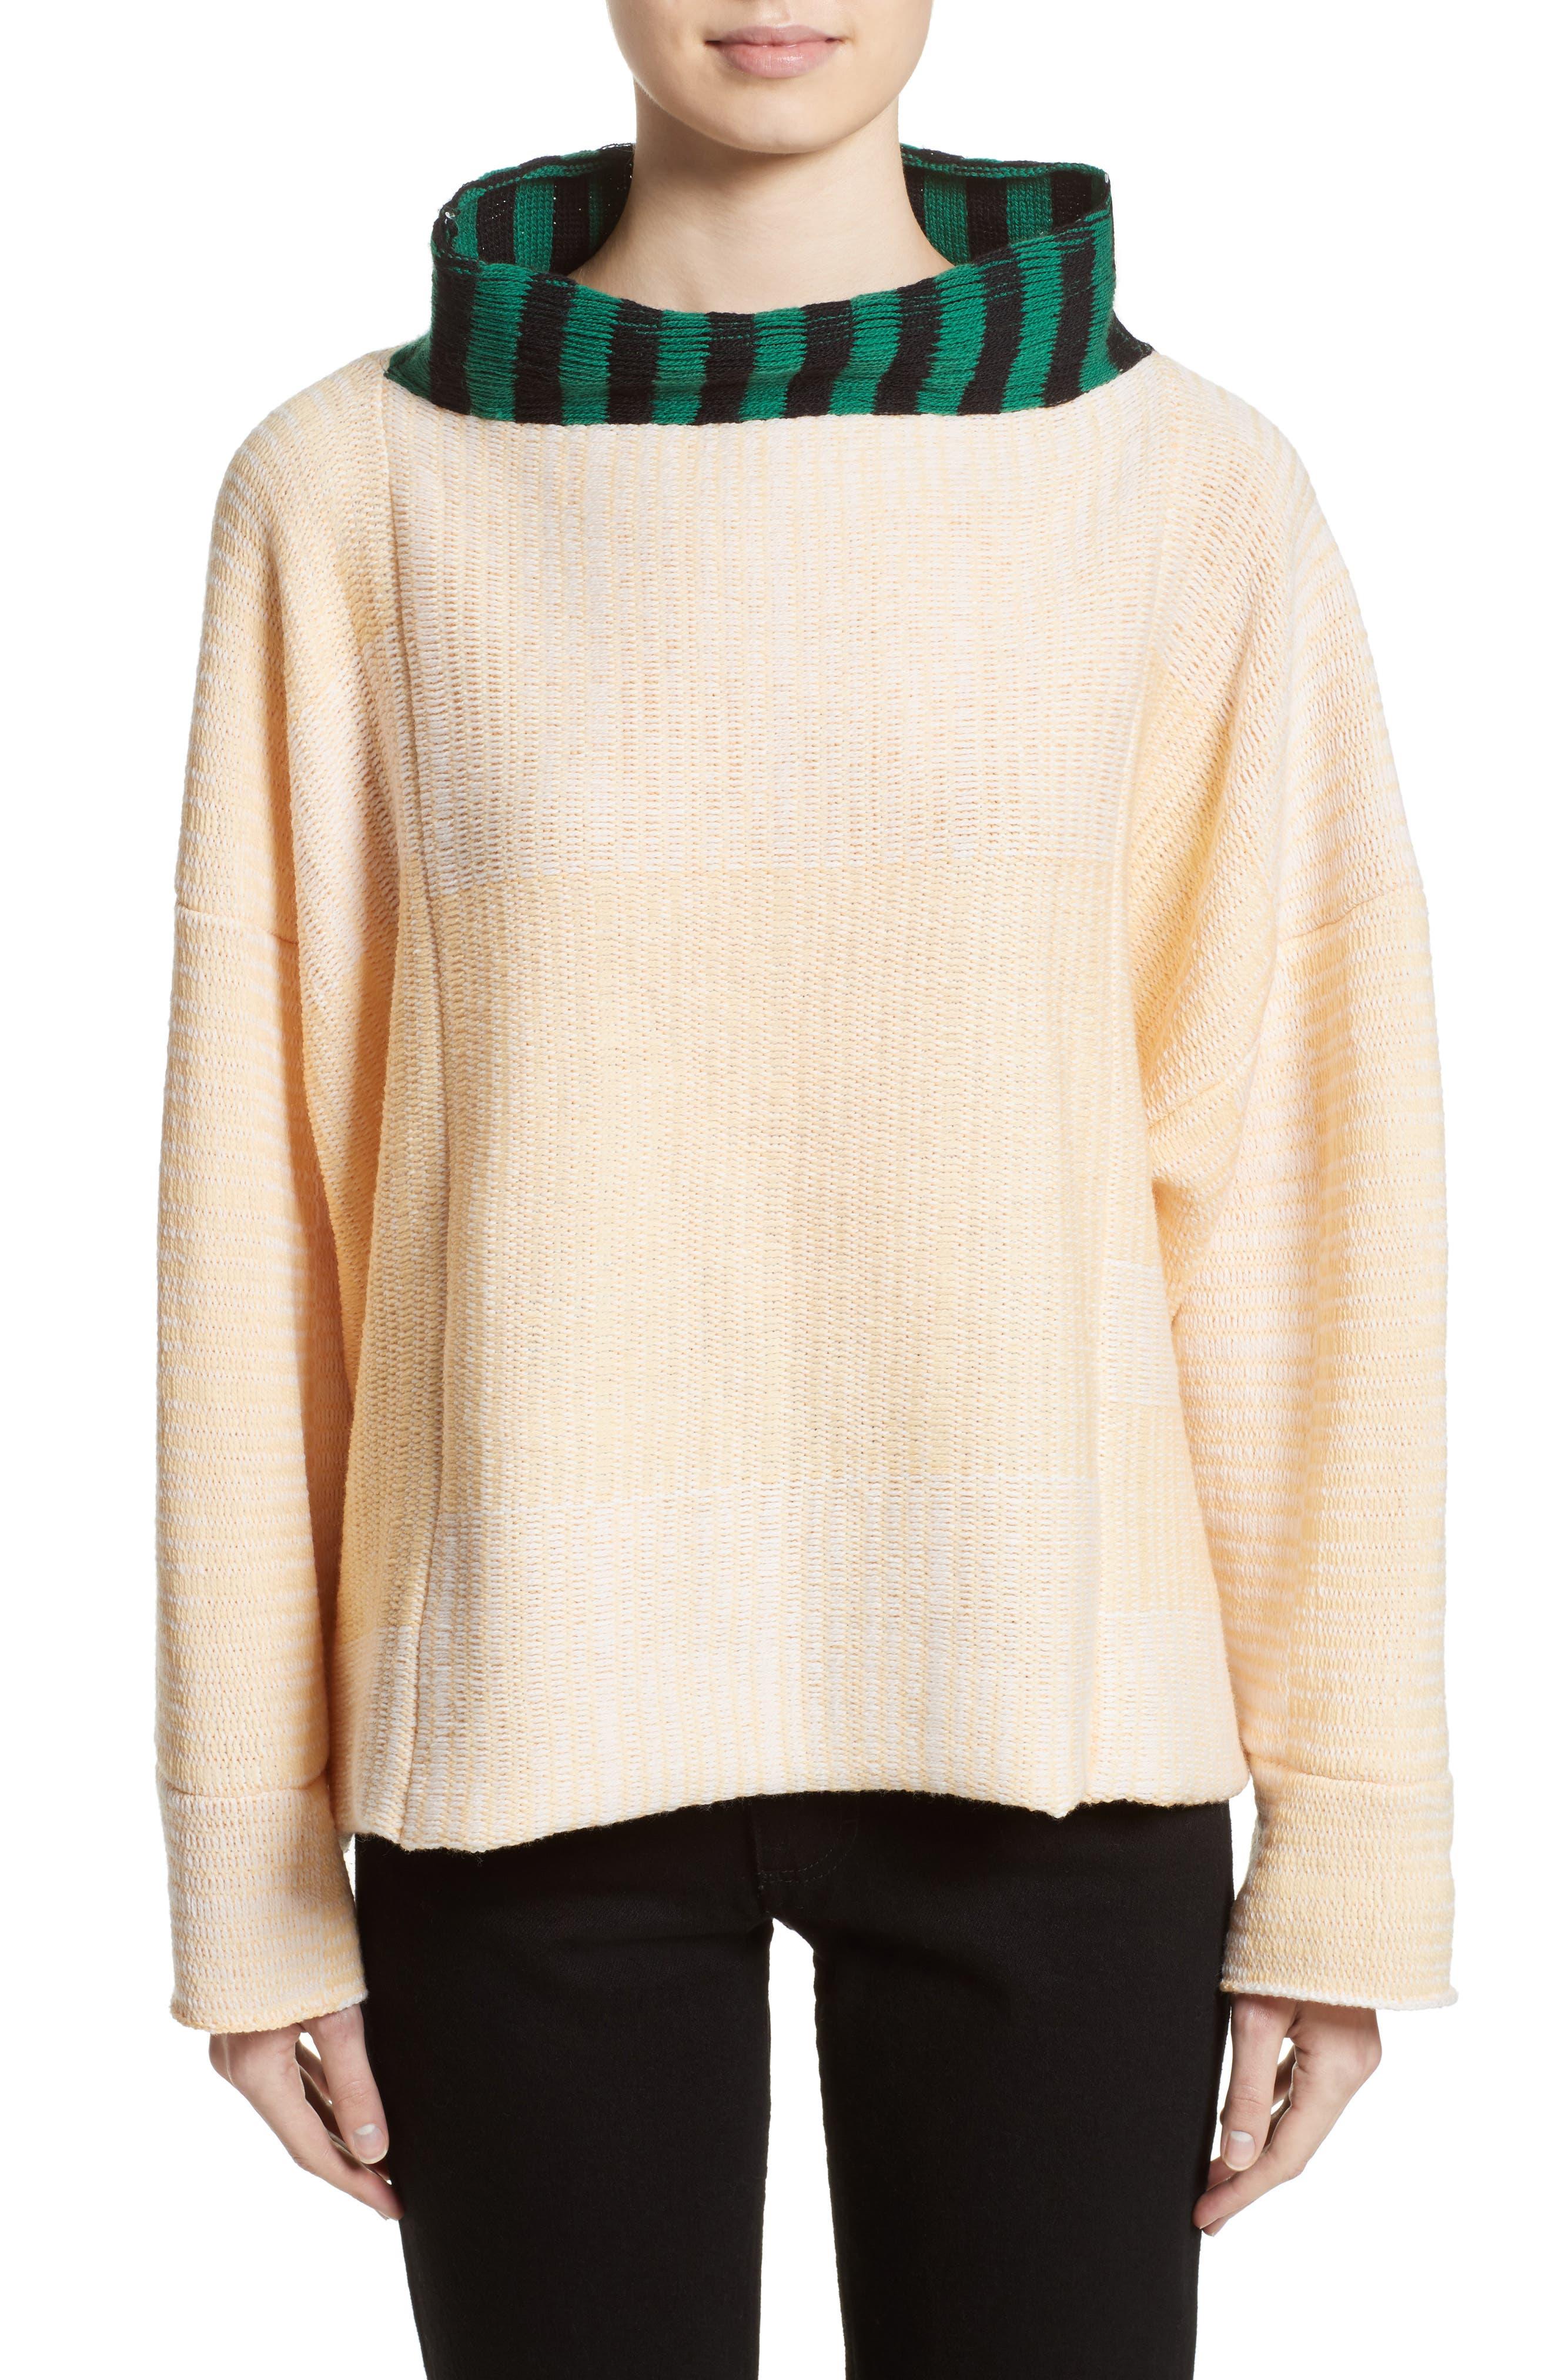 Main Image - Eckhaus Latta Vented Dolman Sweater